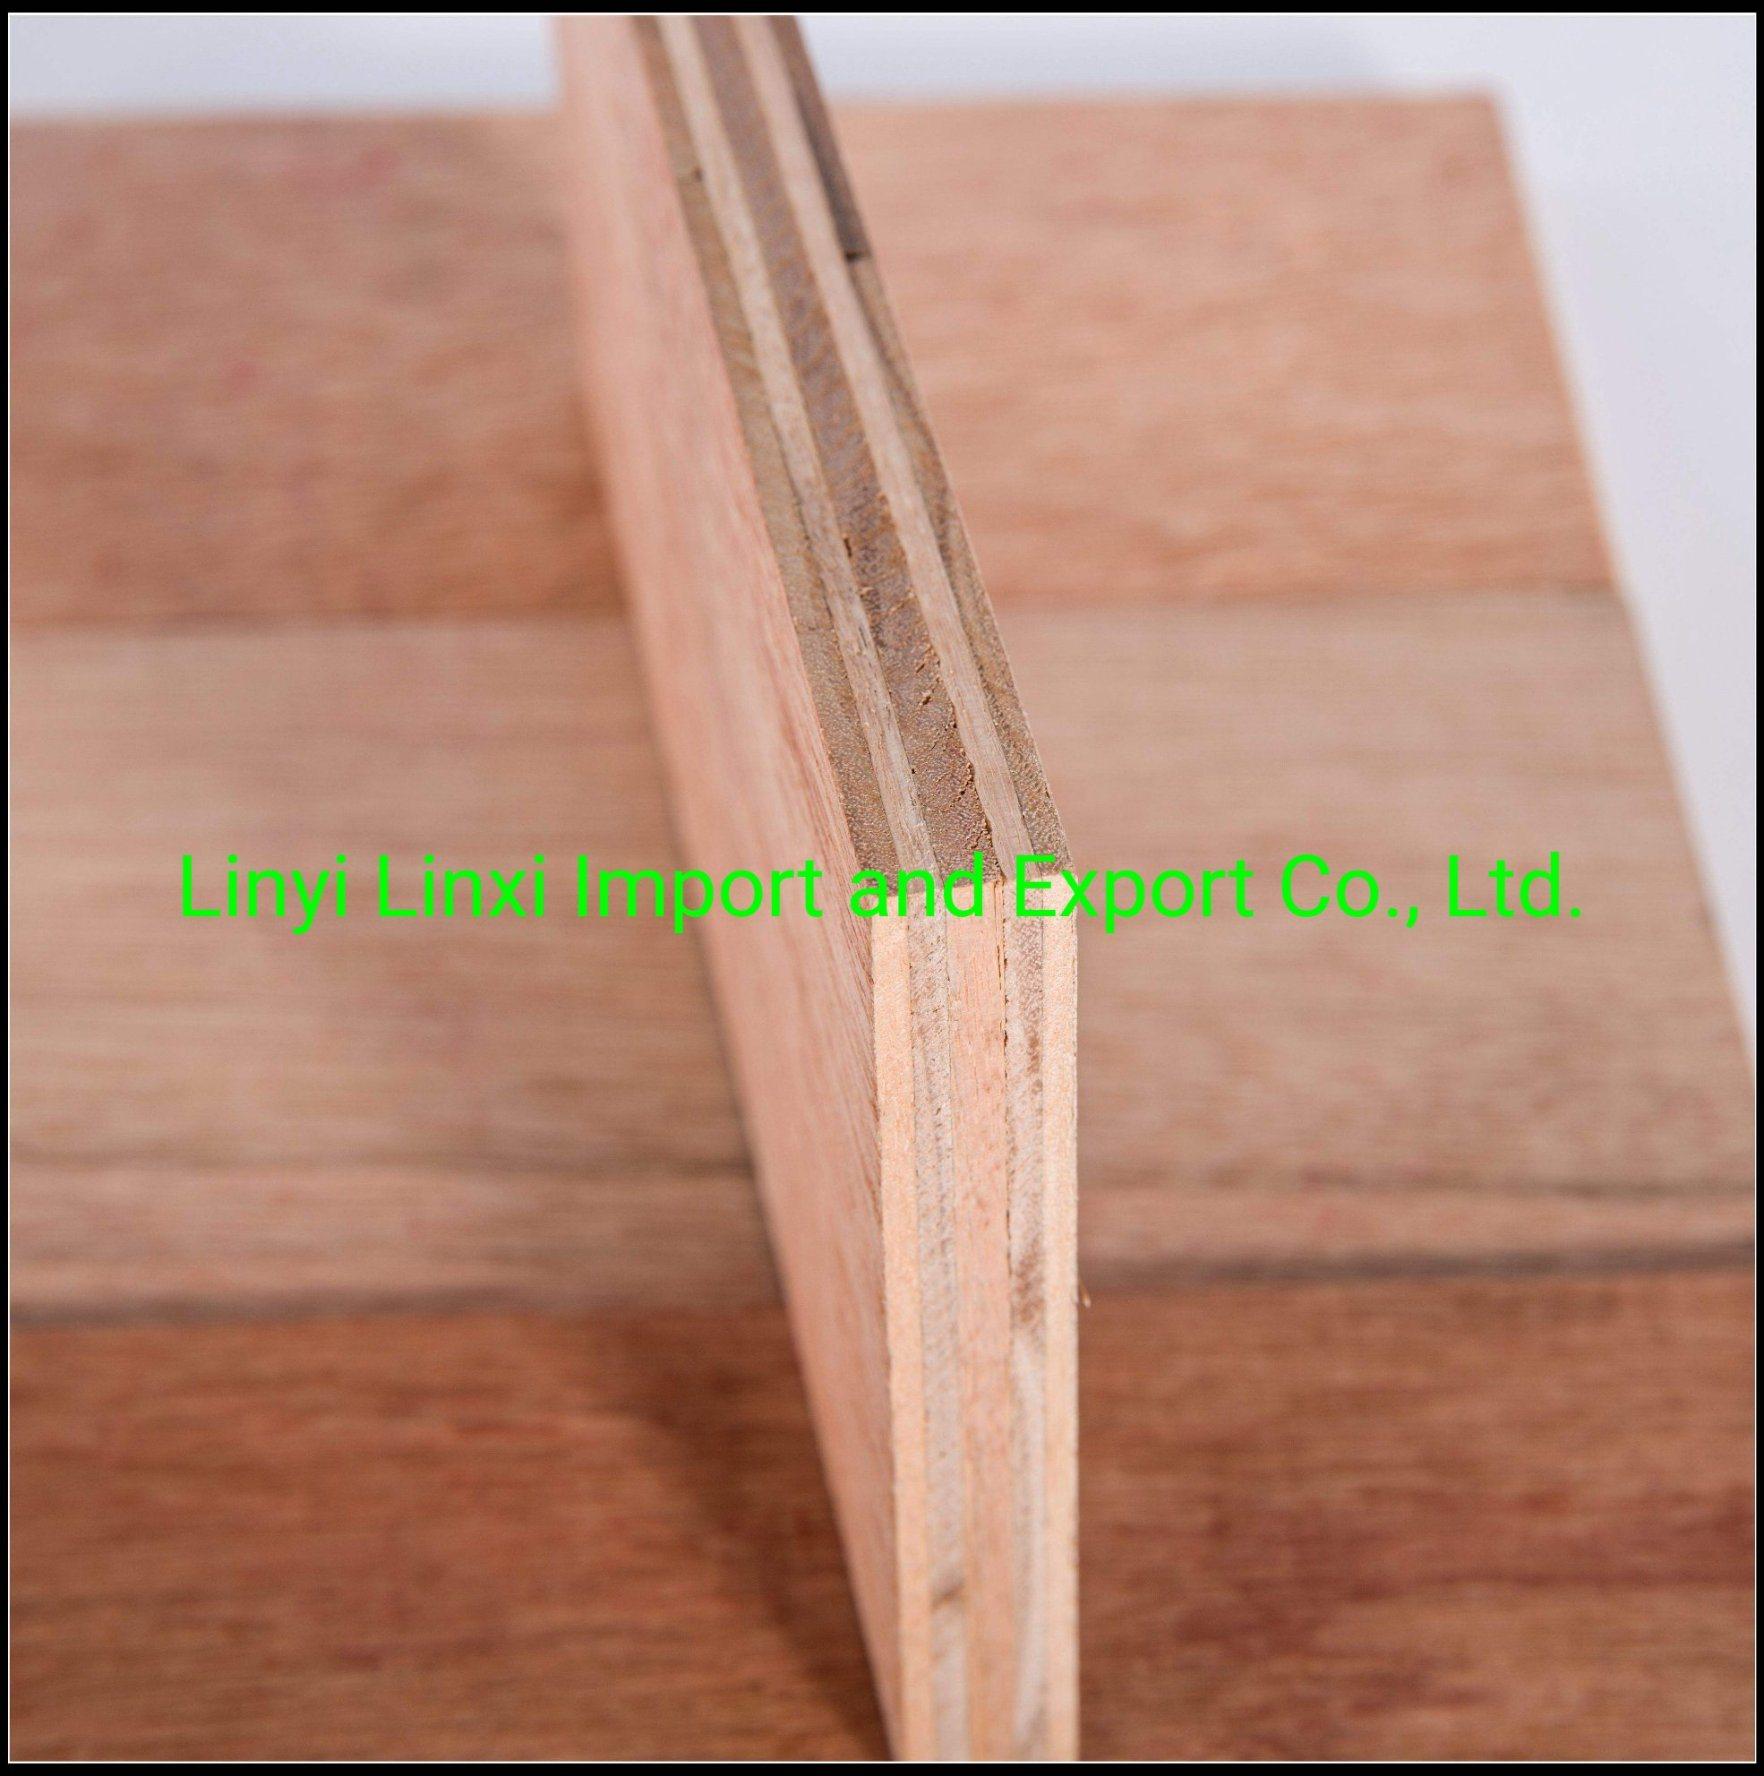 China Poplar Core E1 Glue With, Can I Glue Laminate Flooring To Plywood